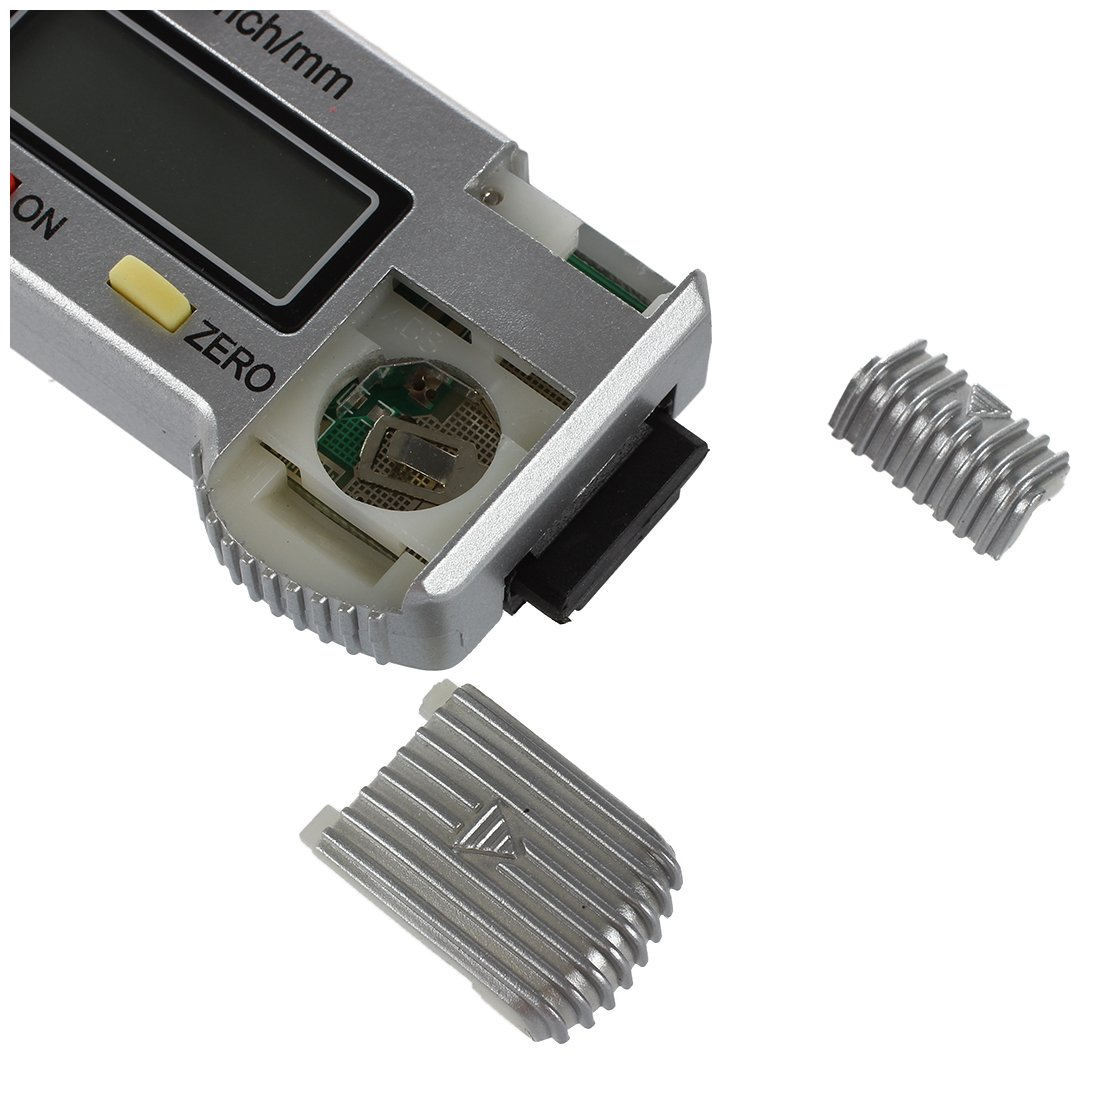 inch SODIAL R Digitaler Reifenprofil Tiefenmesser LCD Reifen Profiltiefenmesser 0-25.4mm Metric